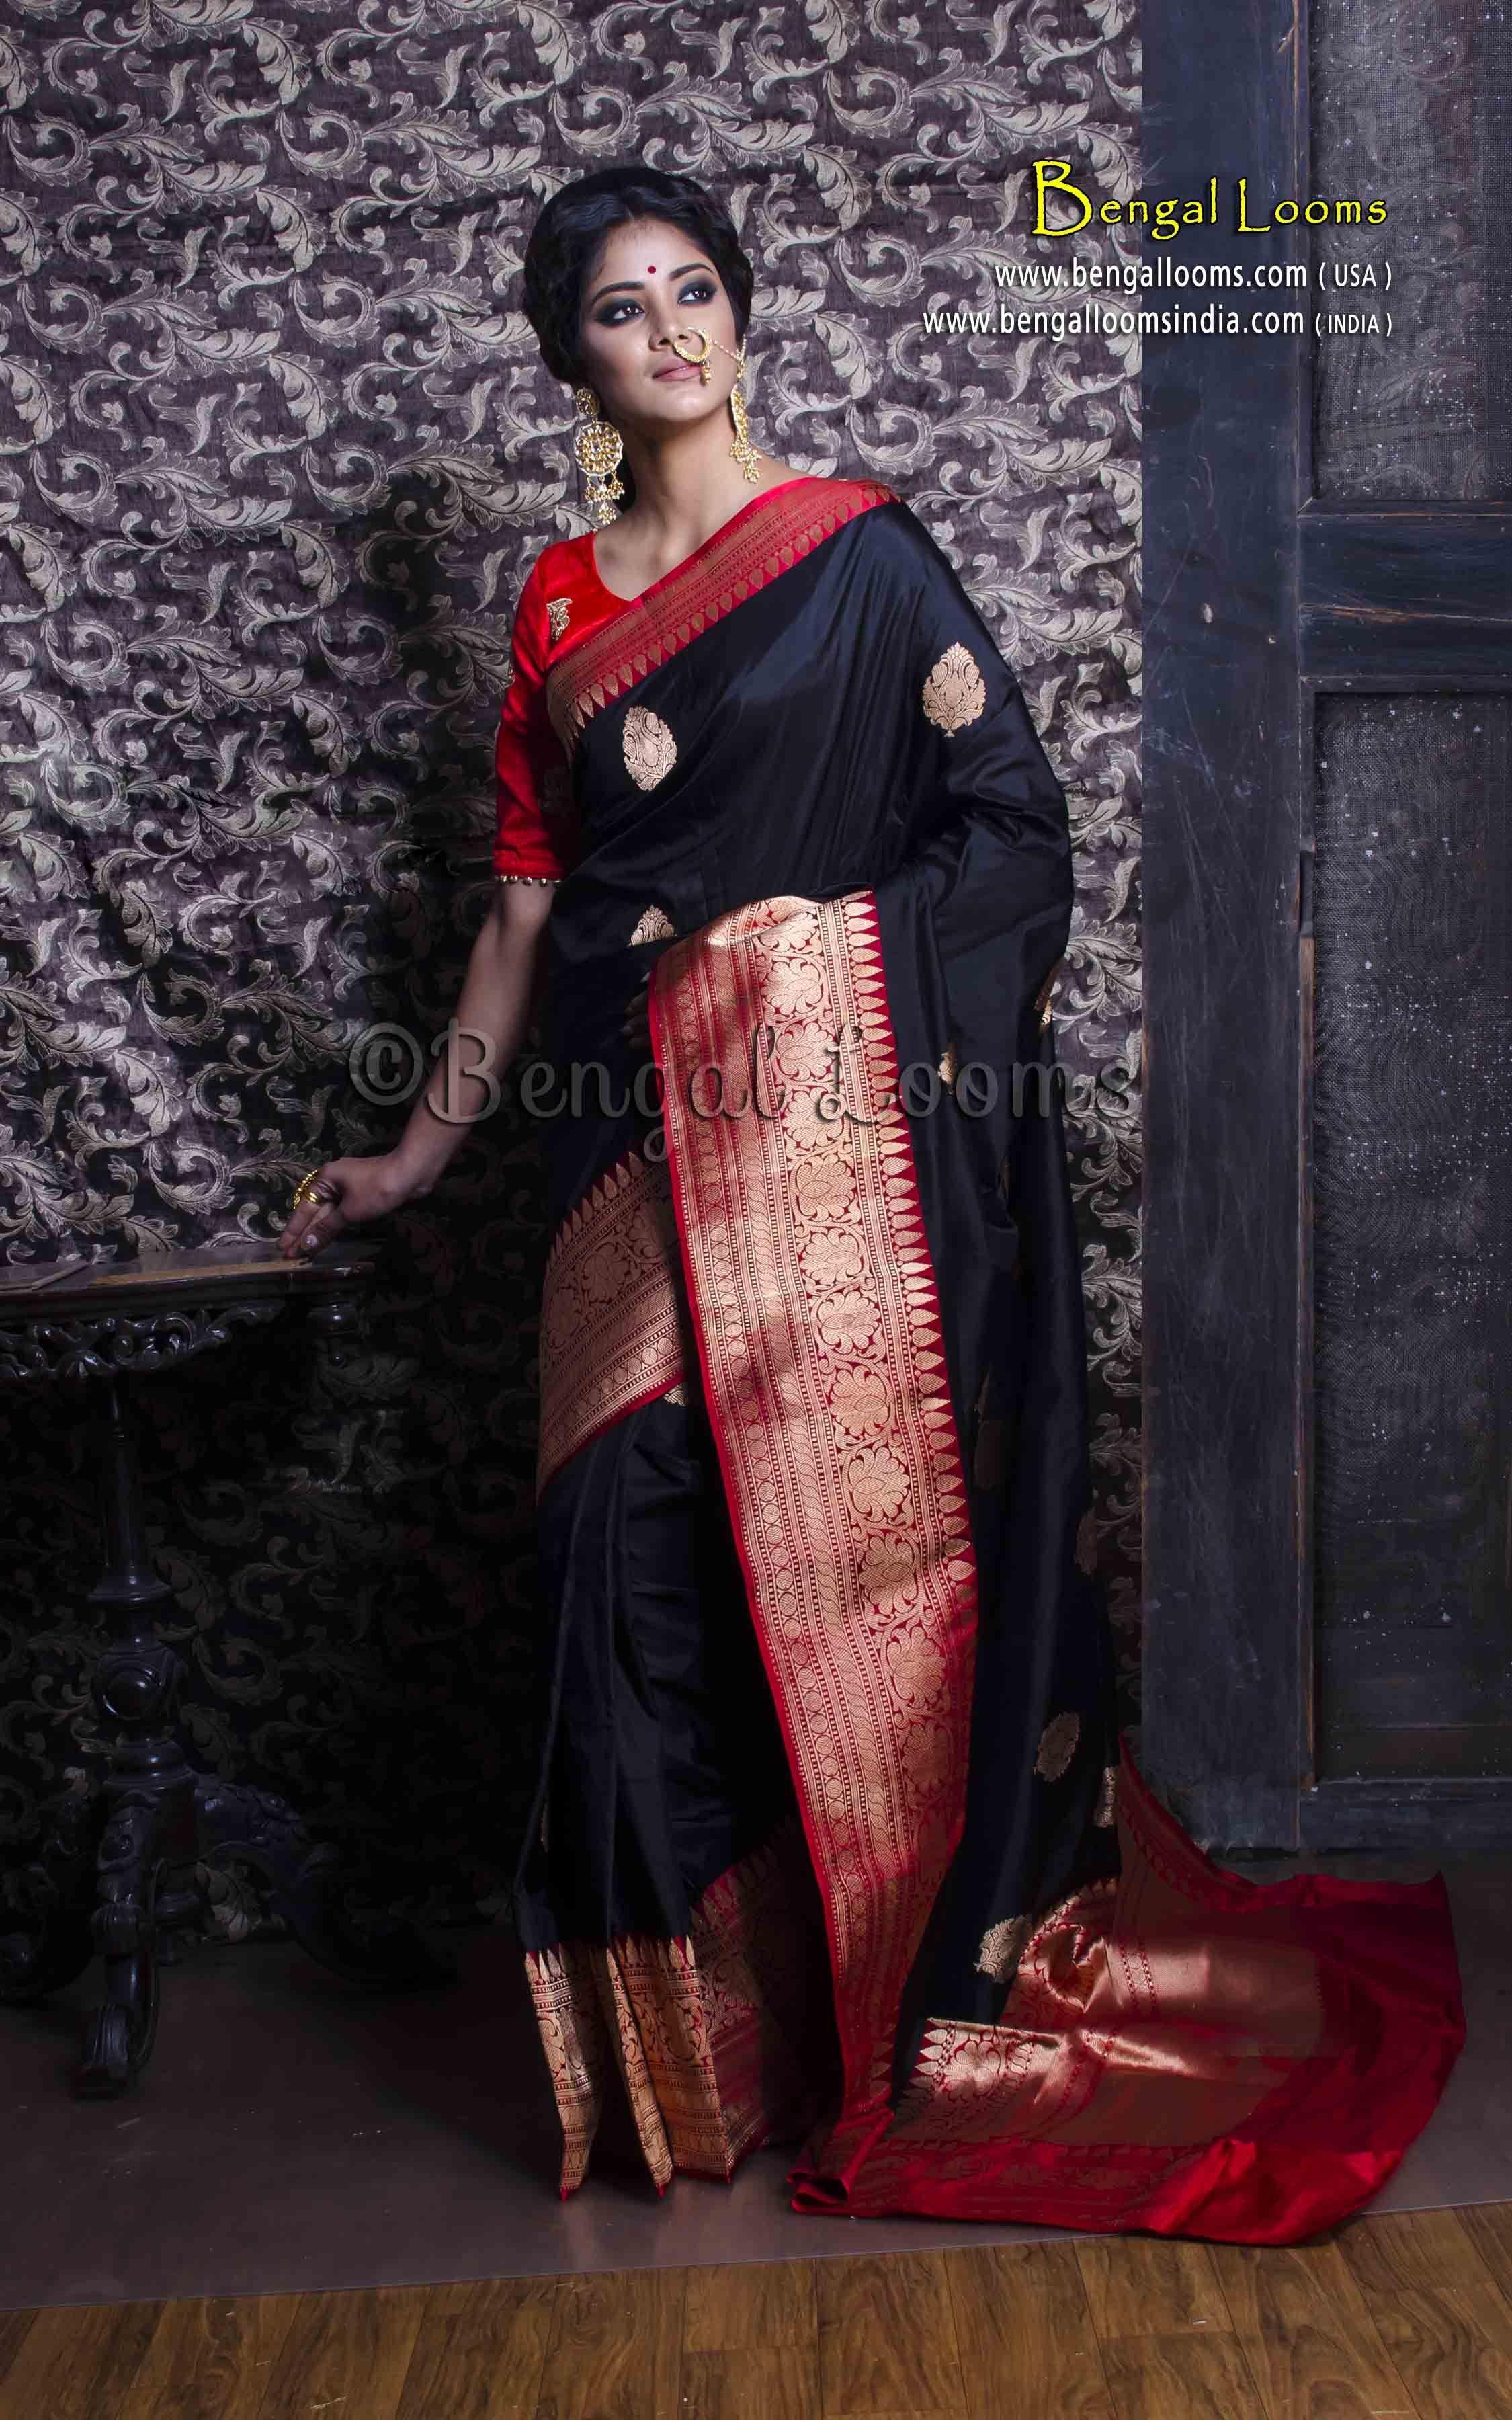 fdfb30ca2 Pure Handloom Katan Silk Banarasi Saree in Black and Red   blouse1 ...